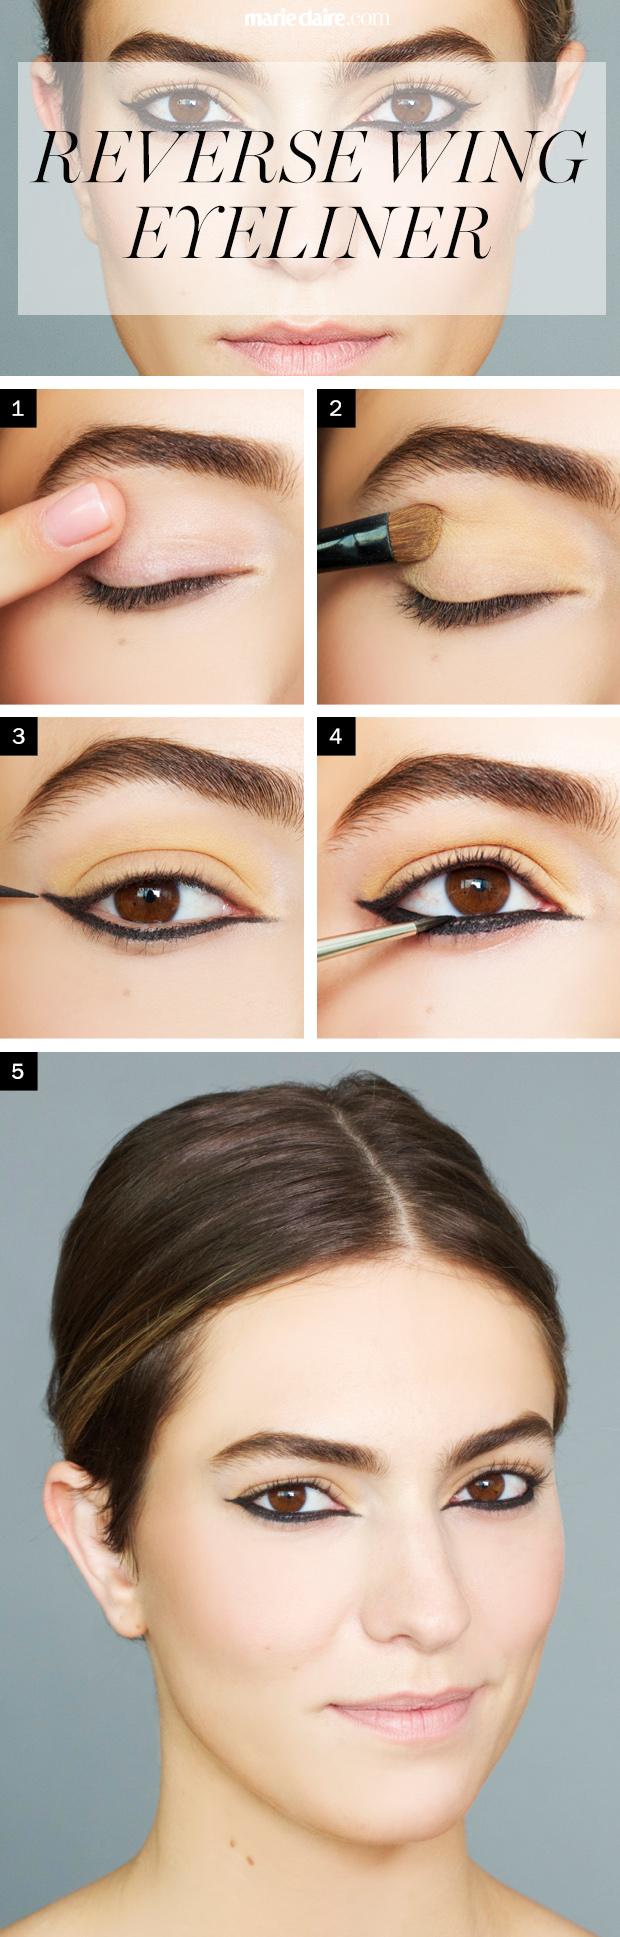 Under Eye Black Eyeliner Tutorial - How To Do a Reverse Undereye ...